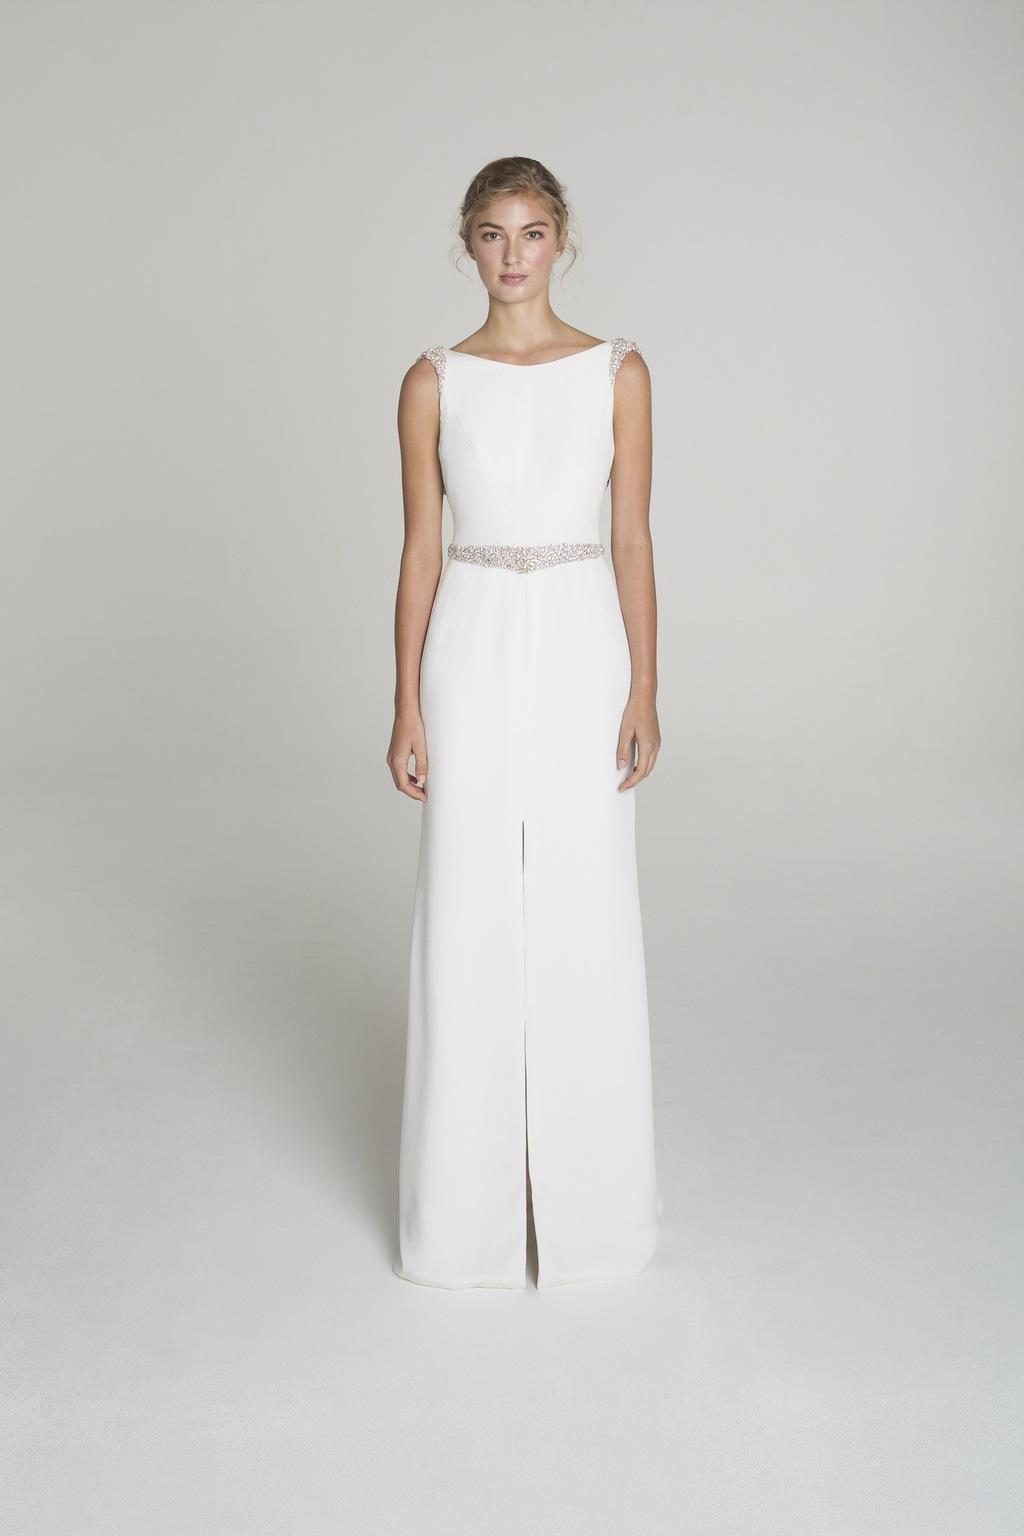 Alana_aoun_wedding_gown_1.full